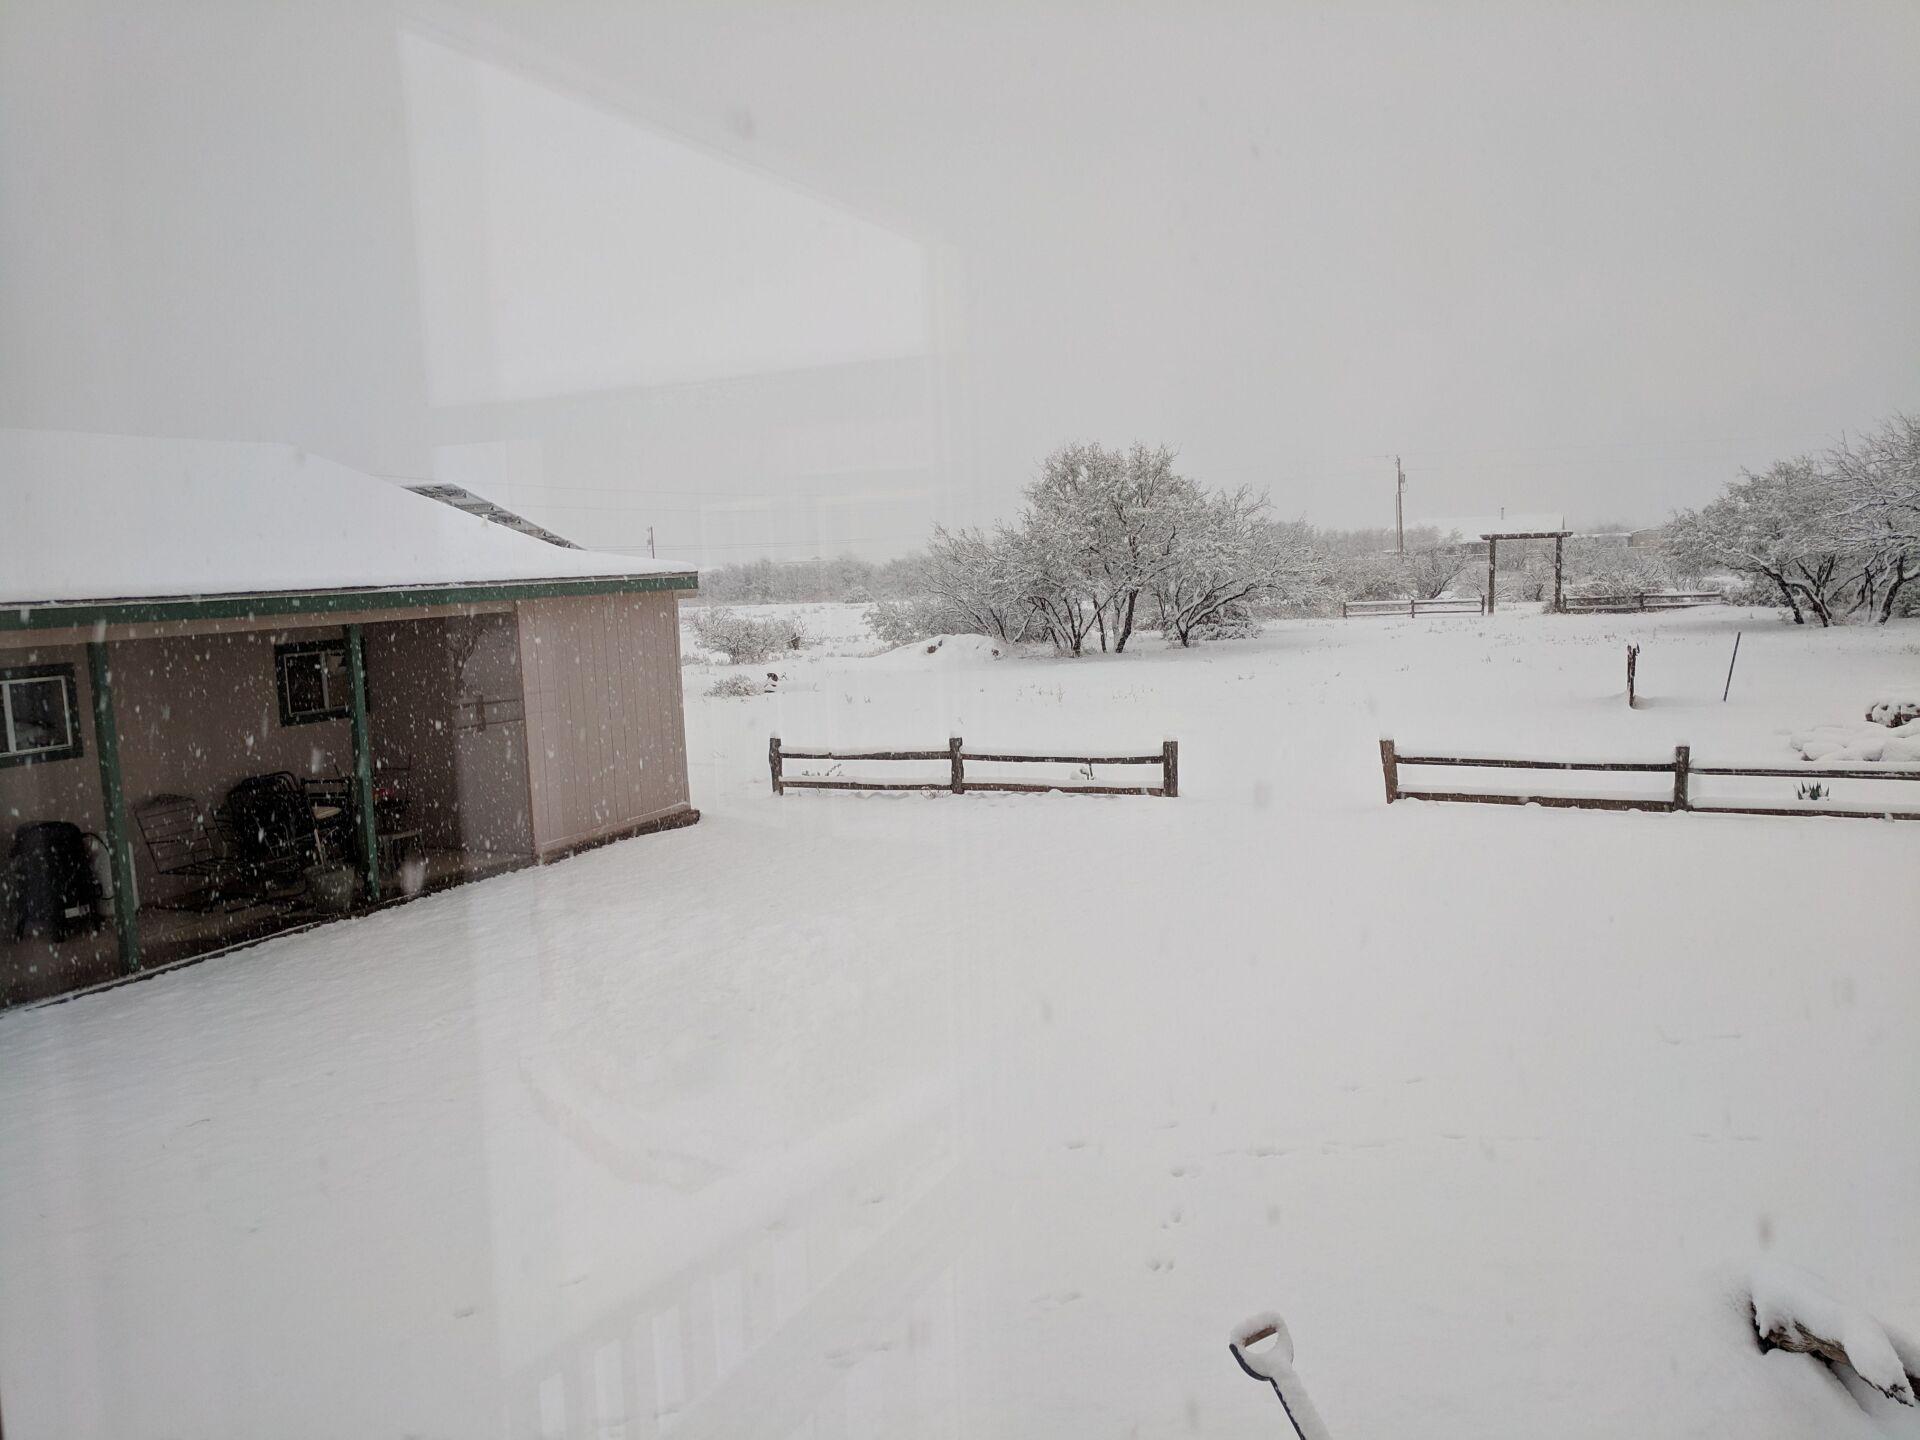 Ted - Snow in Whetstone.jpg